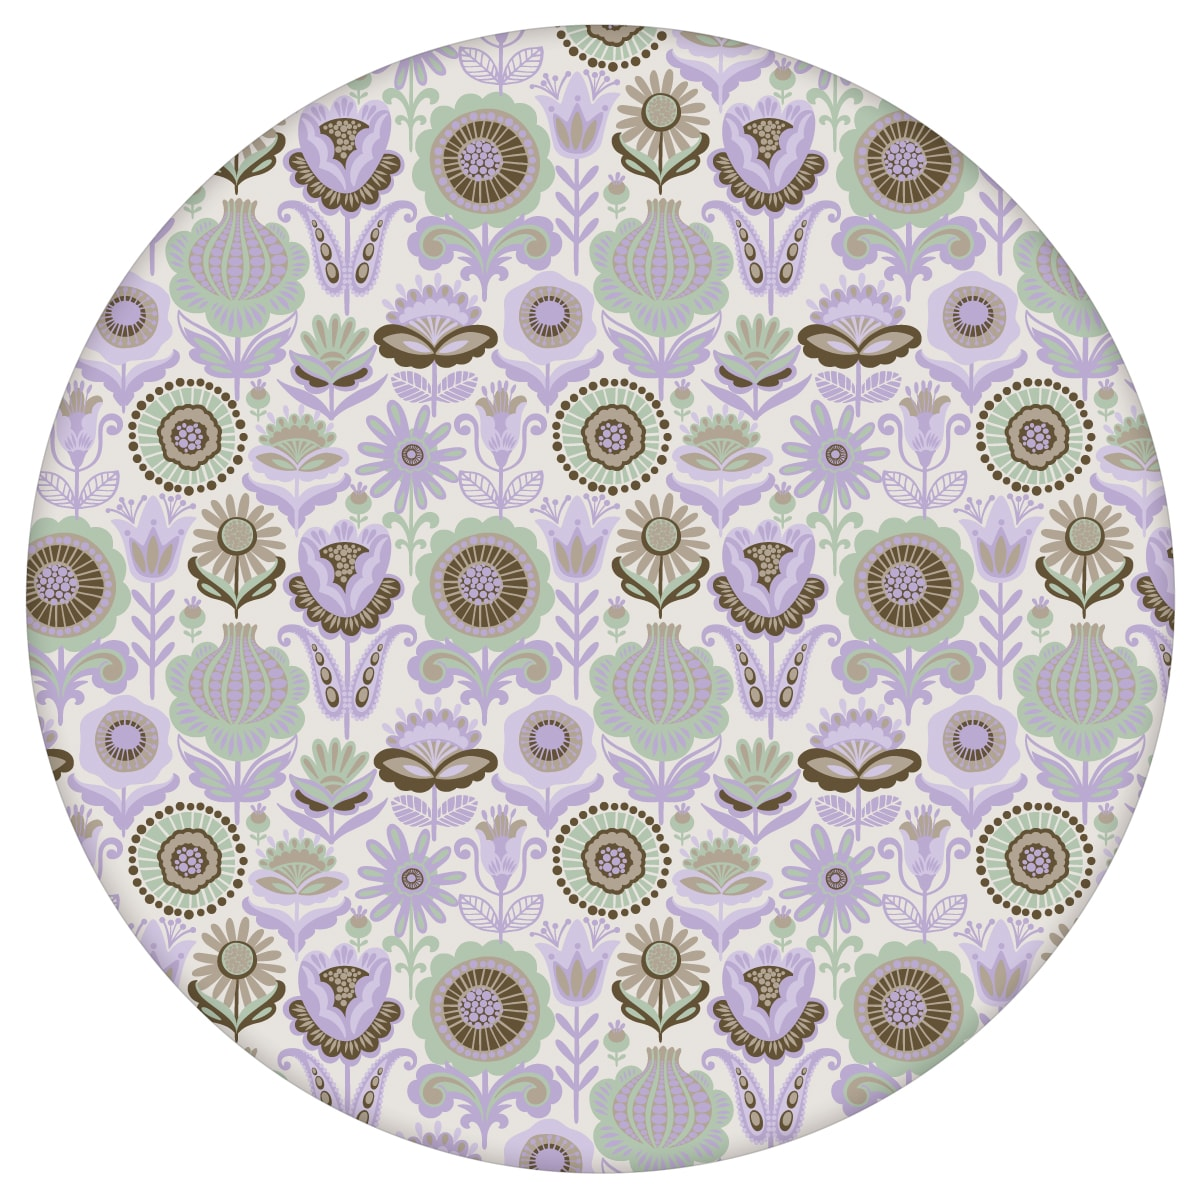 Mint grüne nostalgie Blüten Tapet